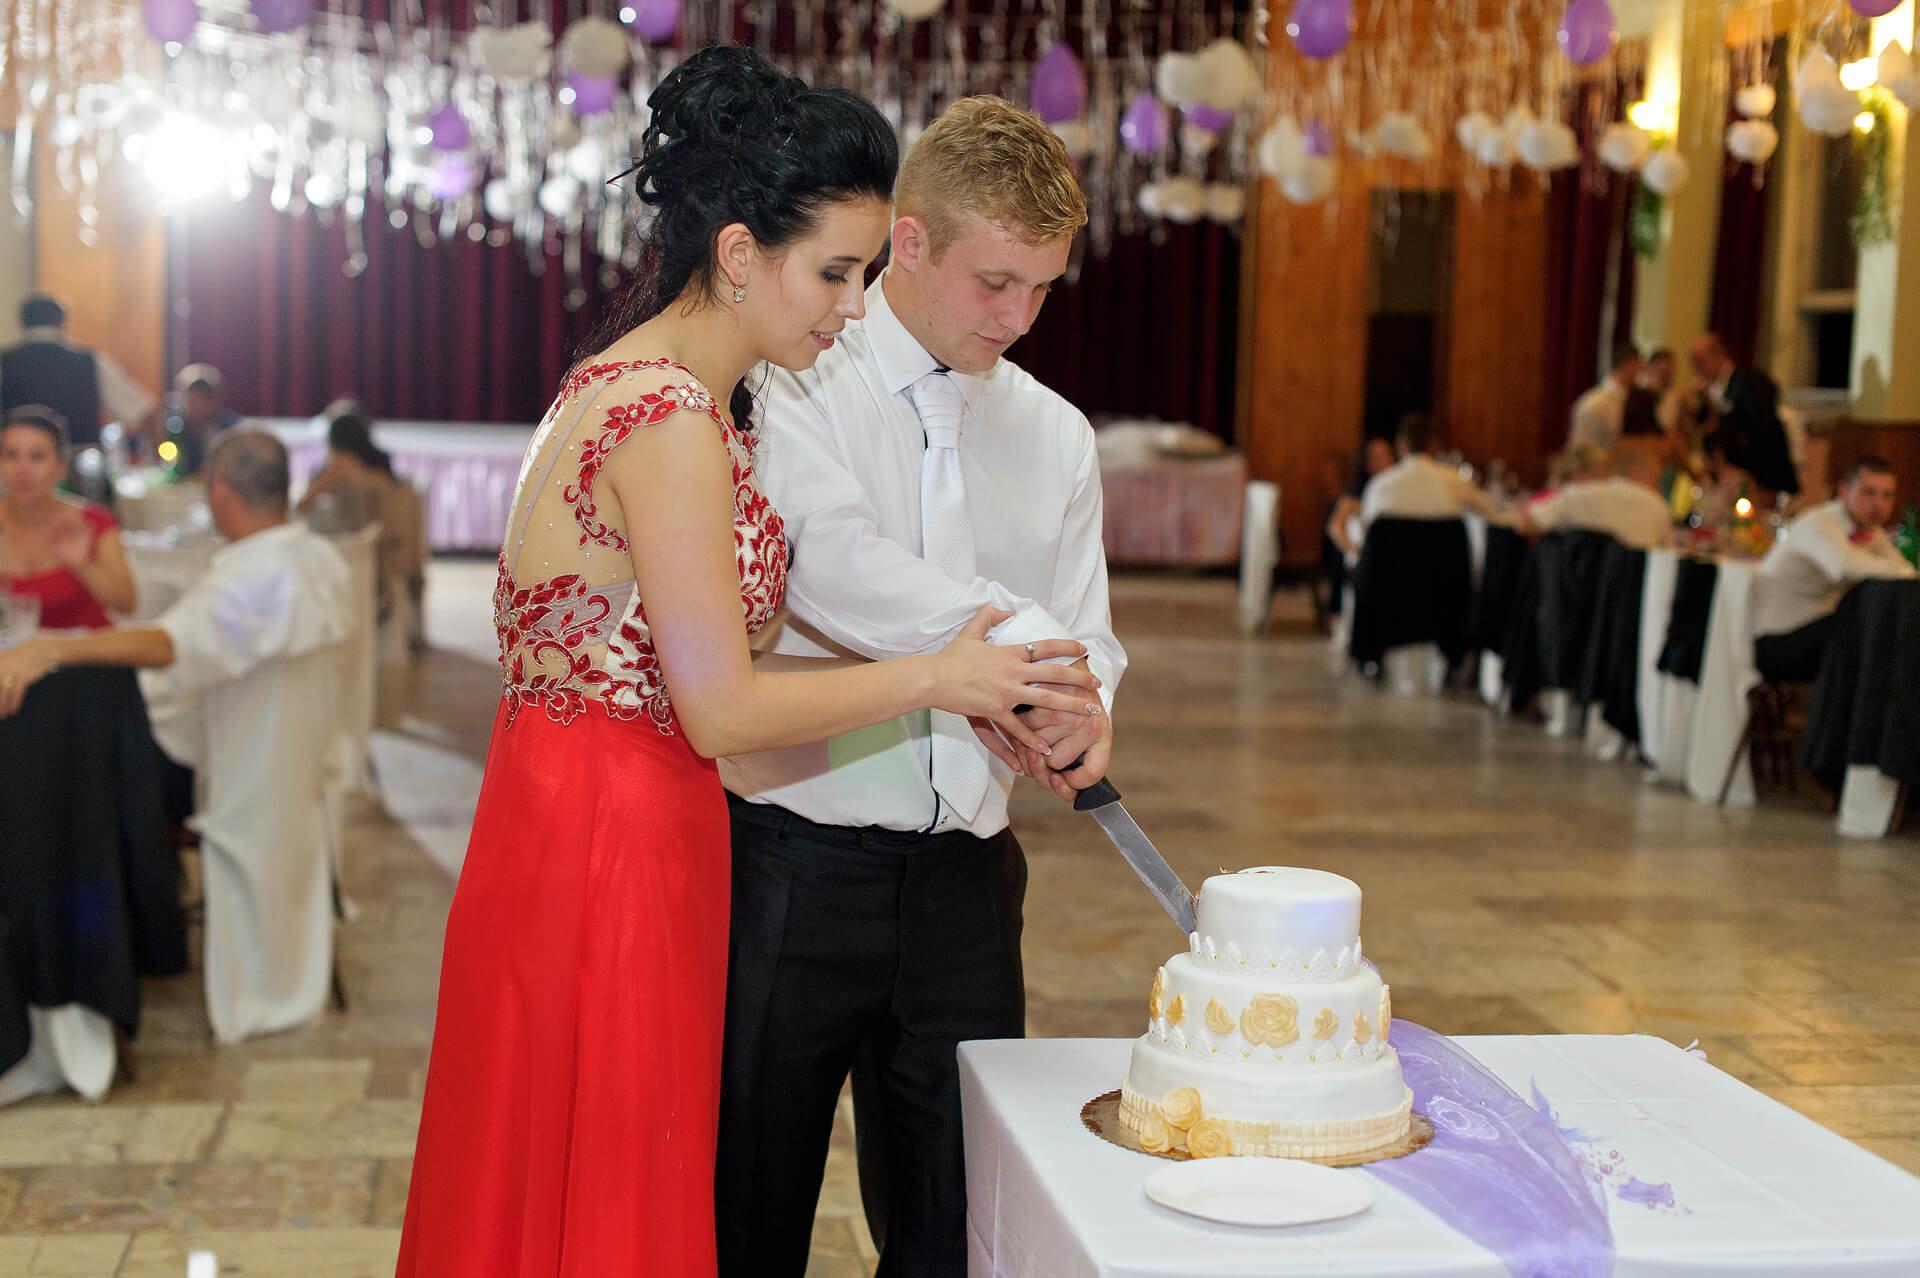 svadba svadobny zabava hostina profesionalne fotenie fotograf Peter Norulak Kosice__09